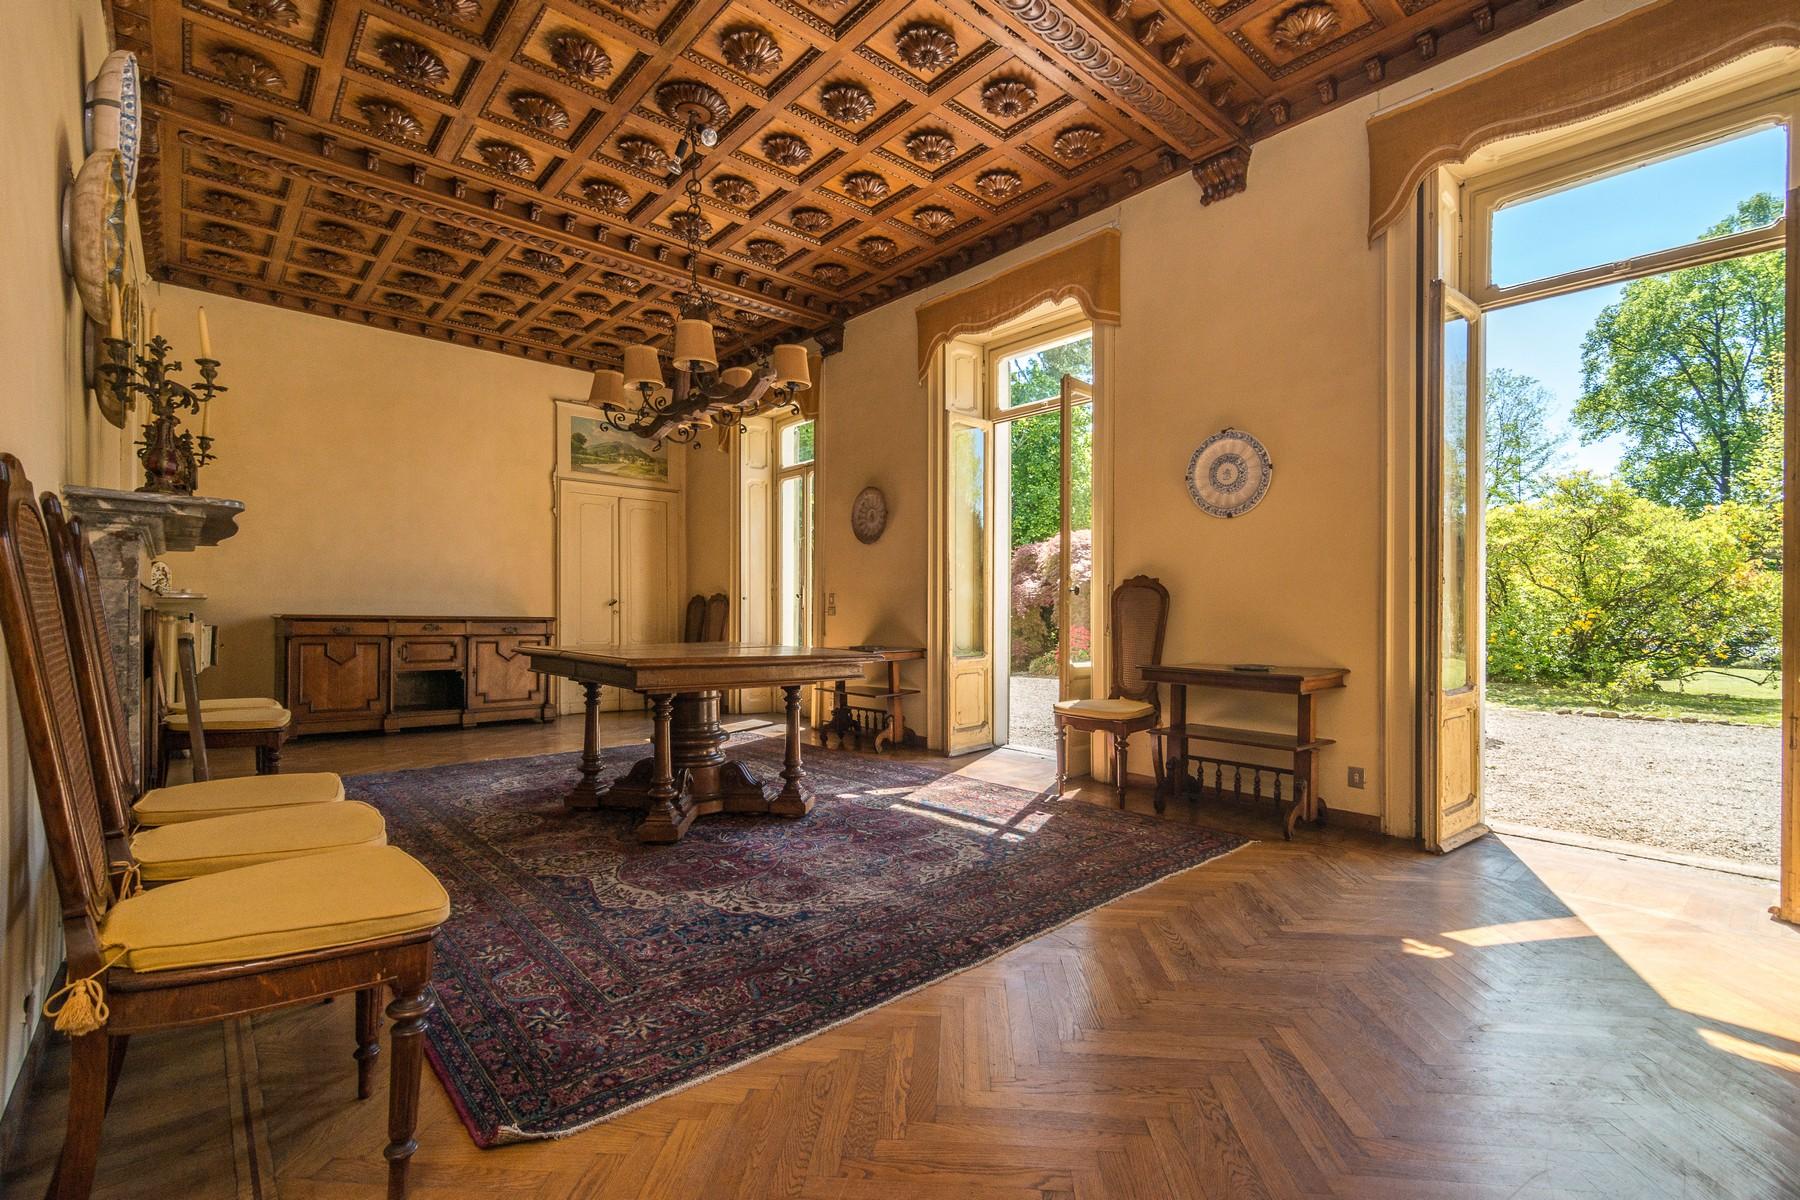 Villa in Vendita a Varese: 5 locali, 1500 mq - Foto 14